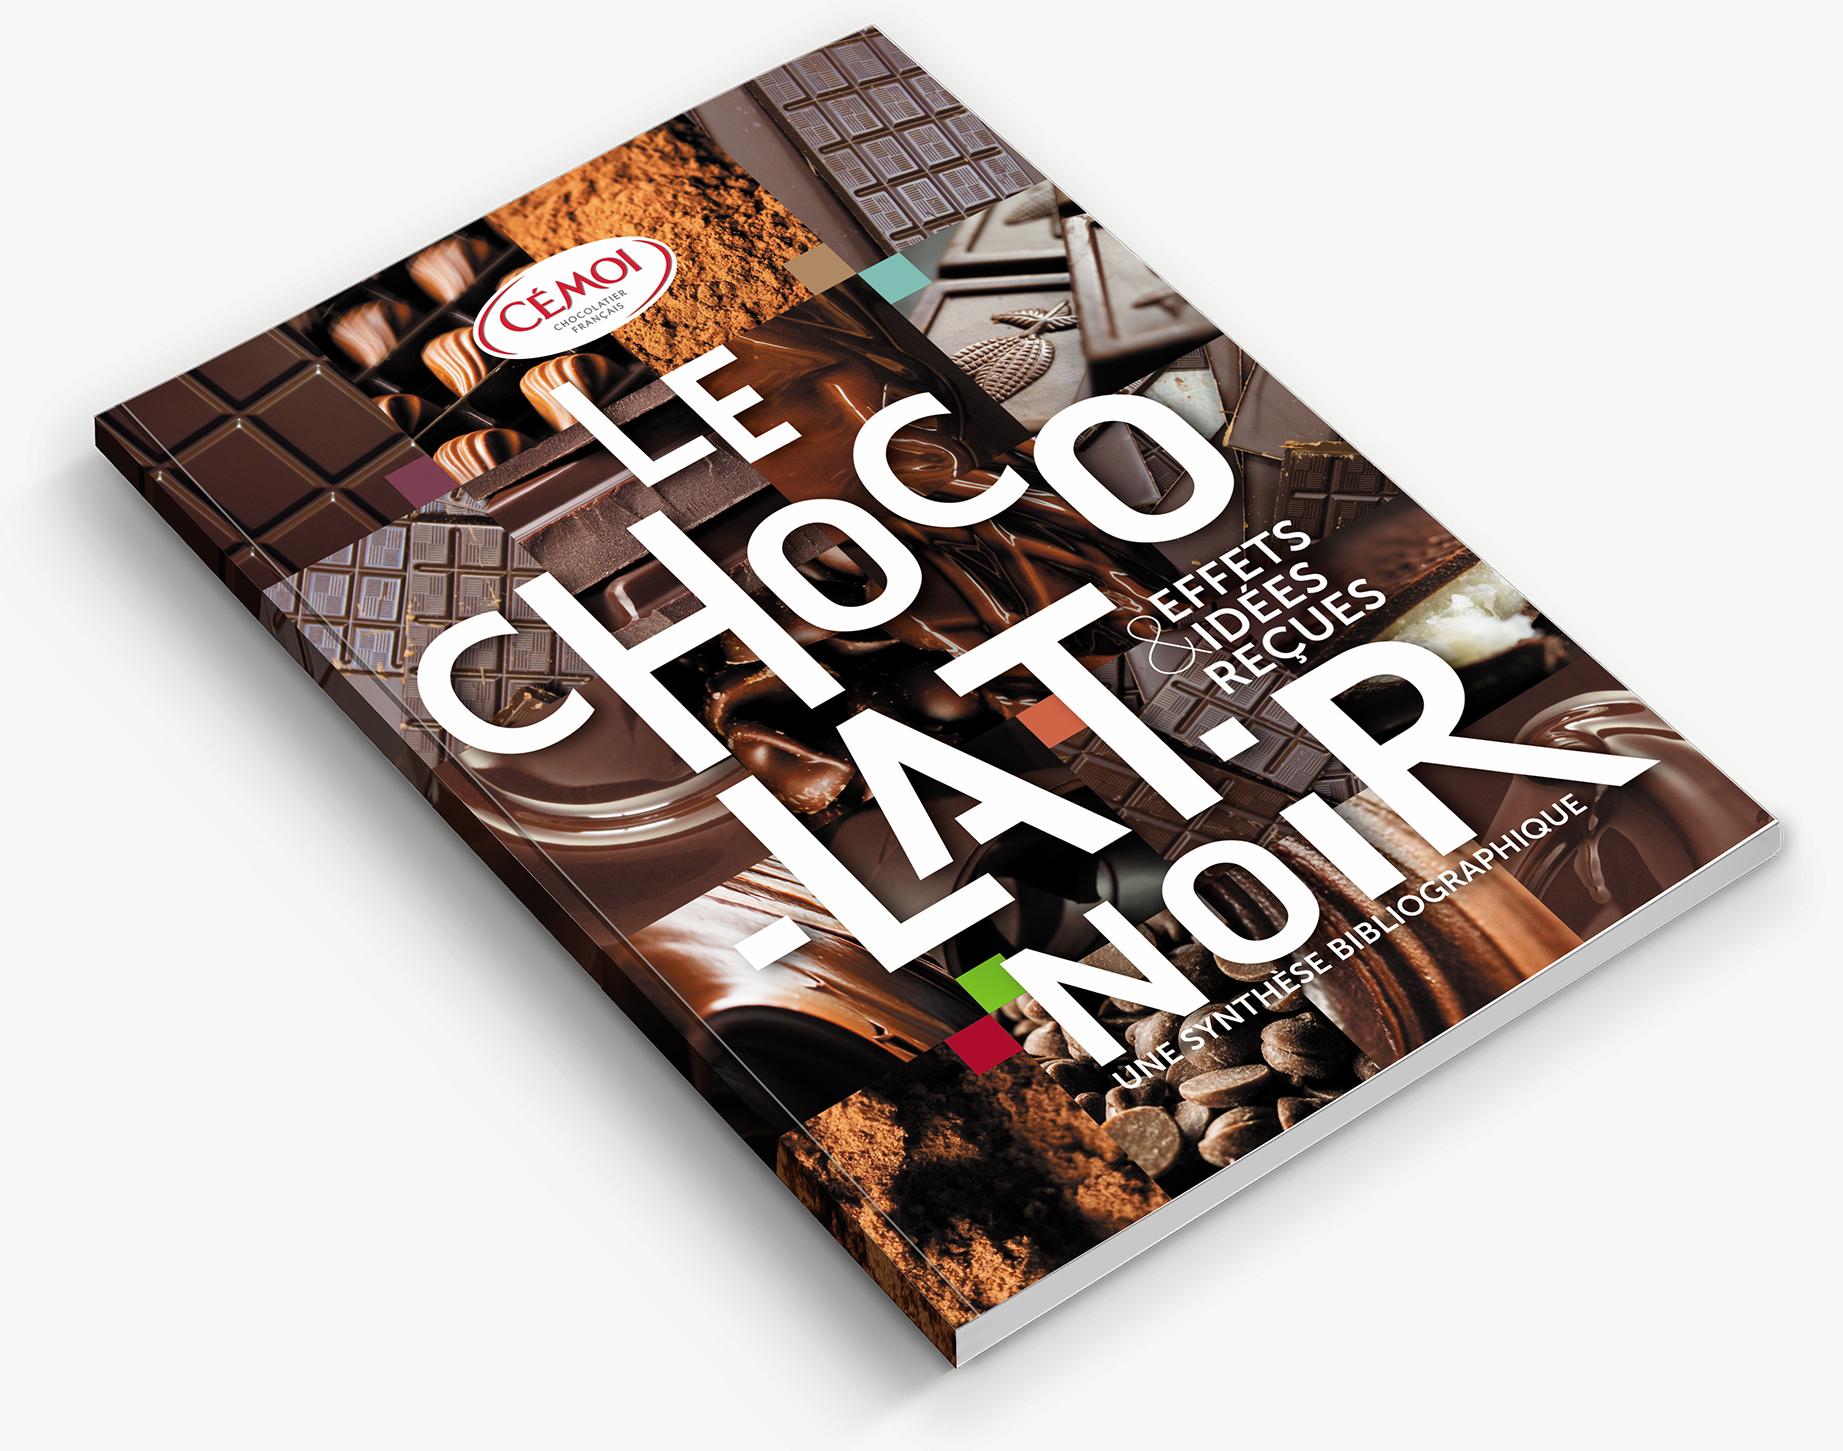 image-cemoi-livret-chocolat-noir-01.jpg